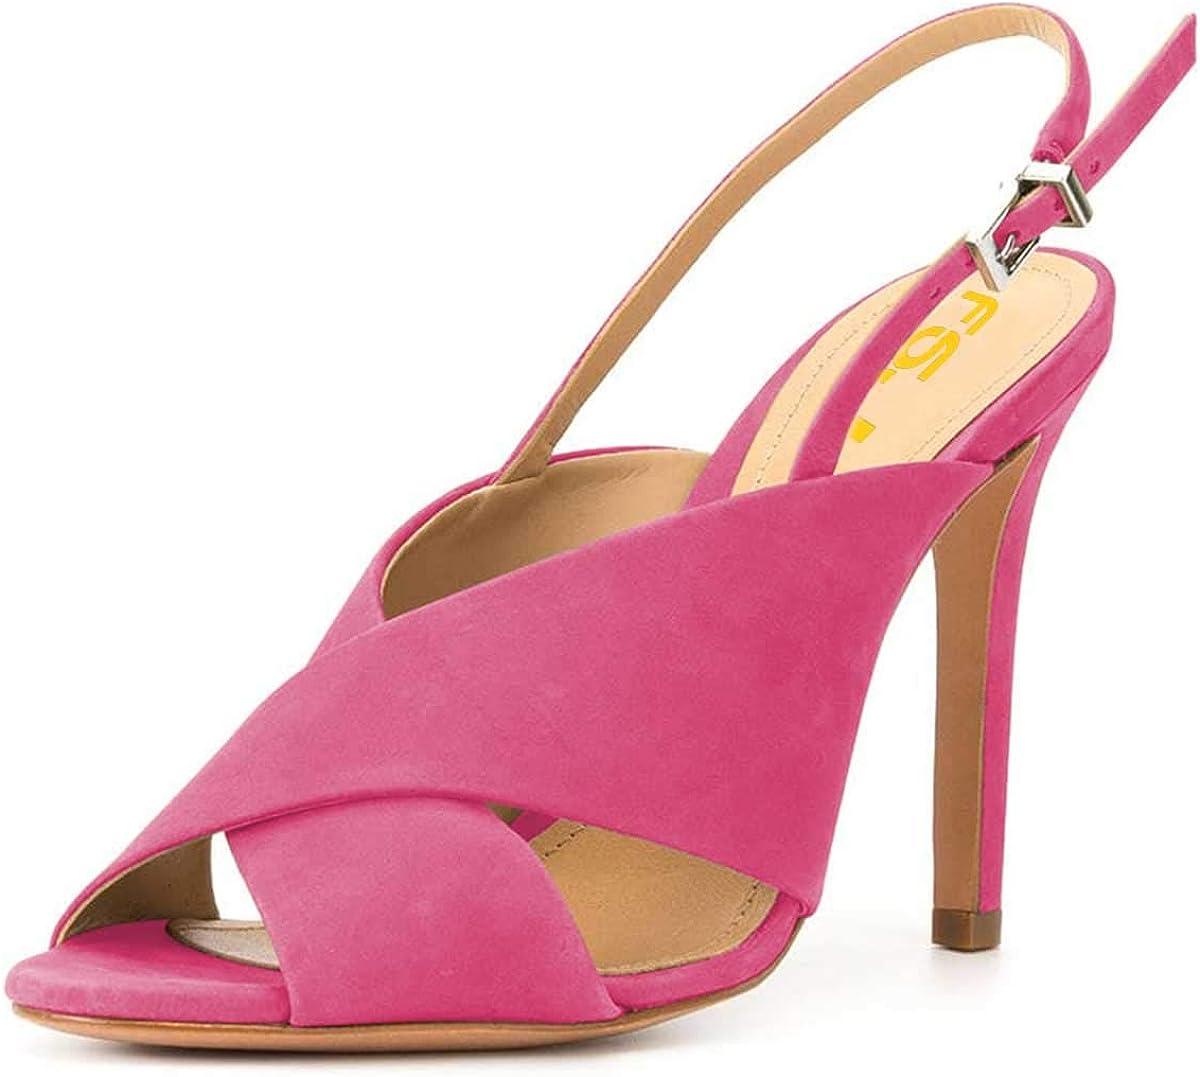 FSJ Women Direct stock discount A surprise price is realized Elegant Slingback Sandals Peep Heel High Toe Stiletto